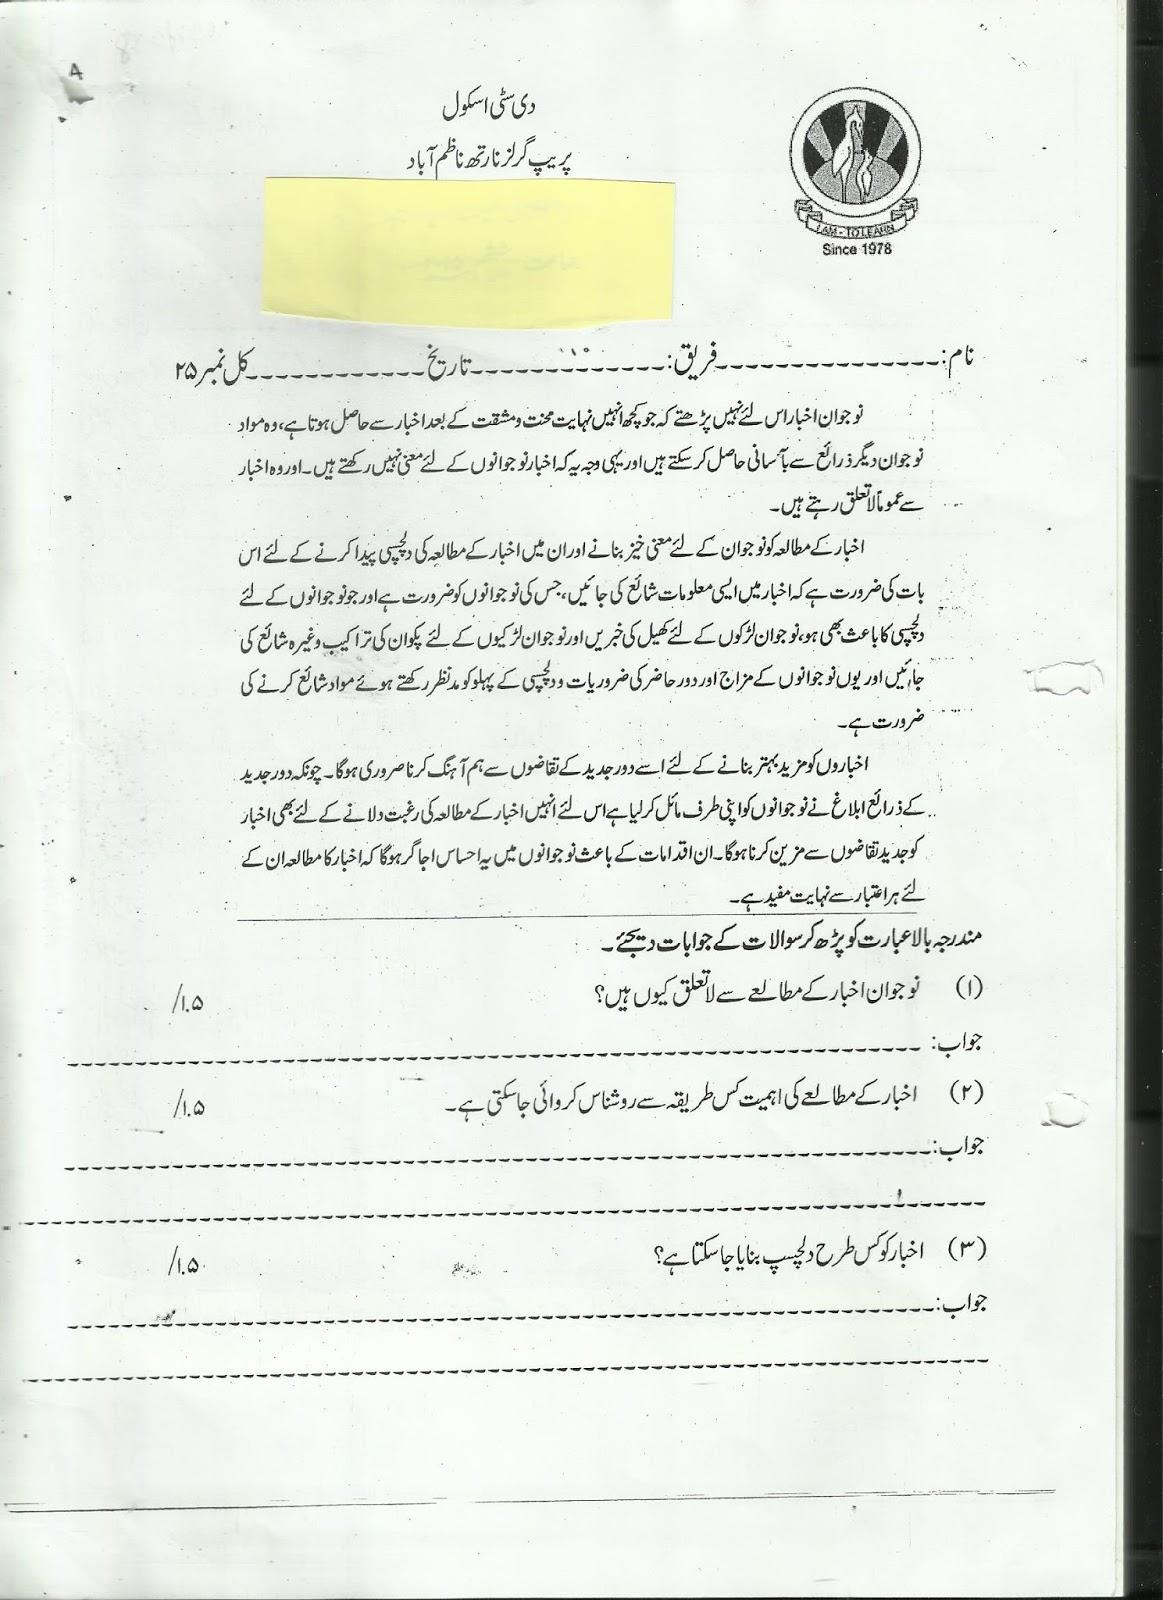 medium resolution of Urdu Tenses Worksheet For Grade 6   Printable Worksheets and Activities for  Teachers